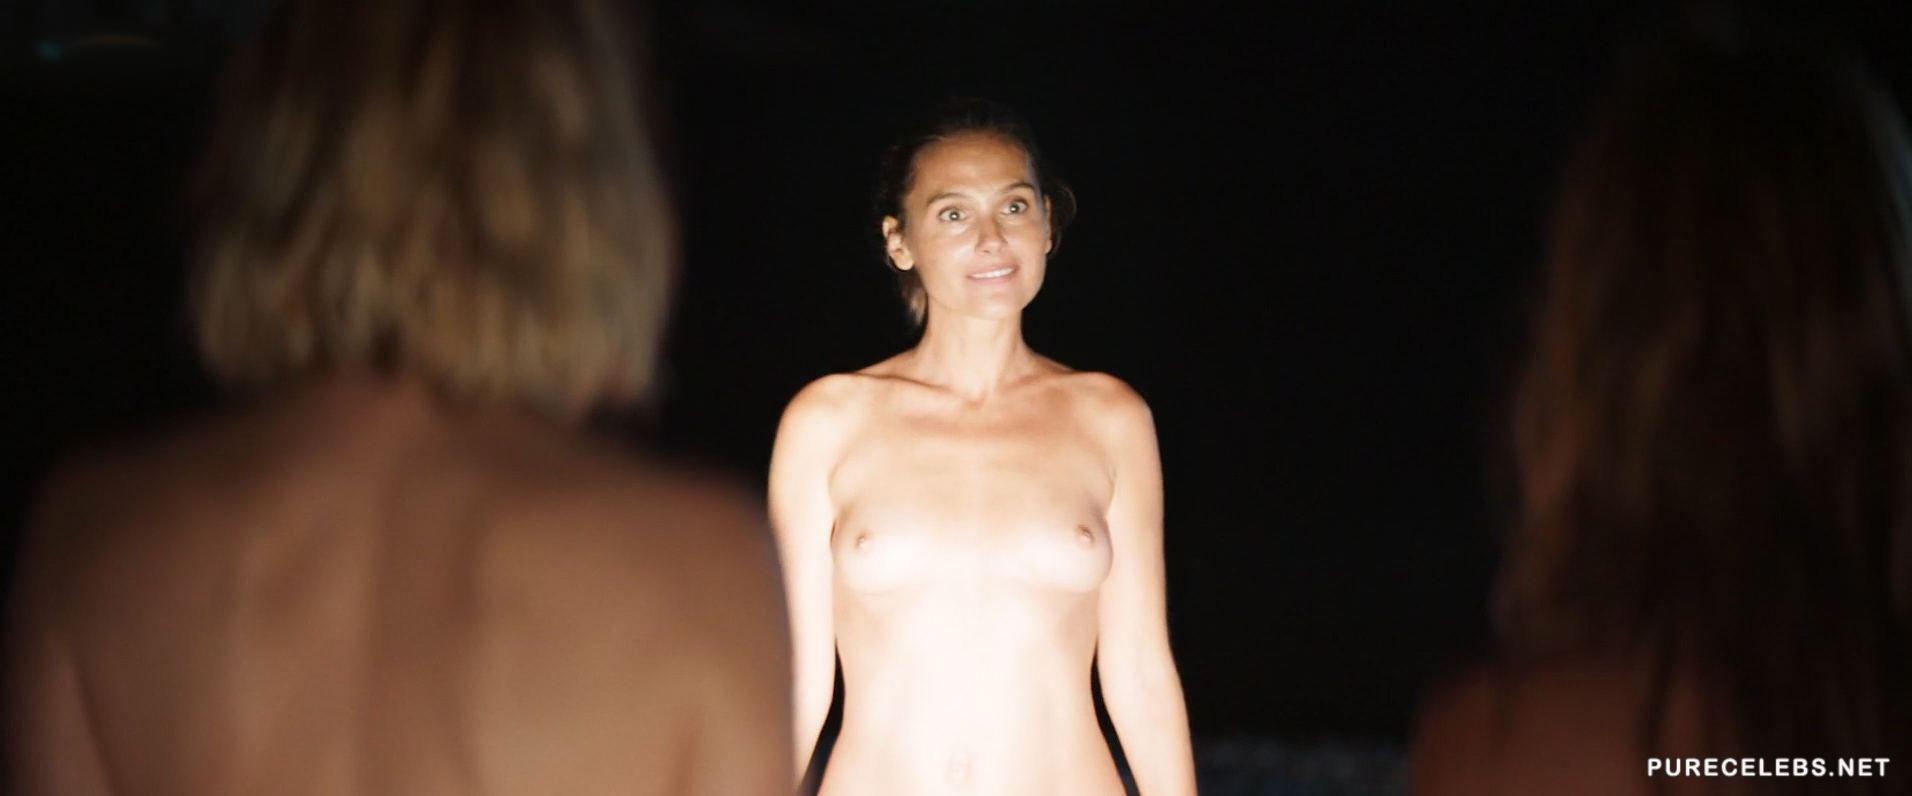 Virginie ledoyen nude pussy pregnant in saint ange